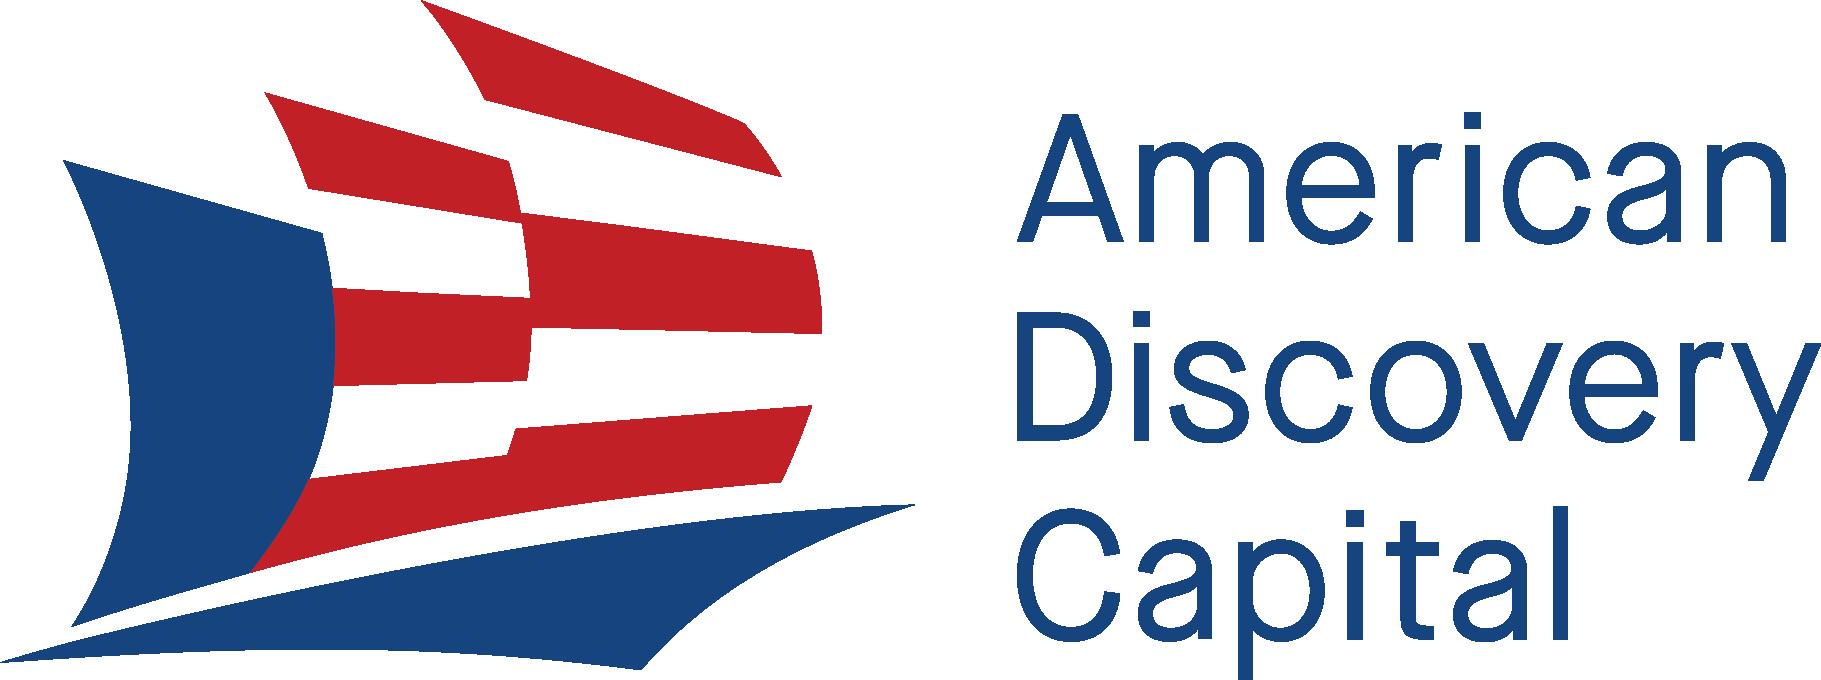 AD-17-9341_Logo.png